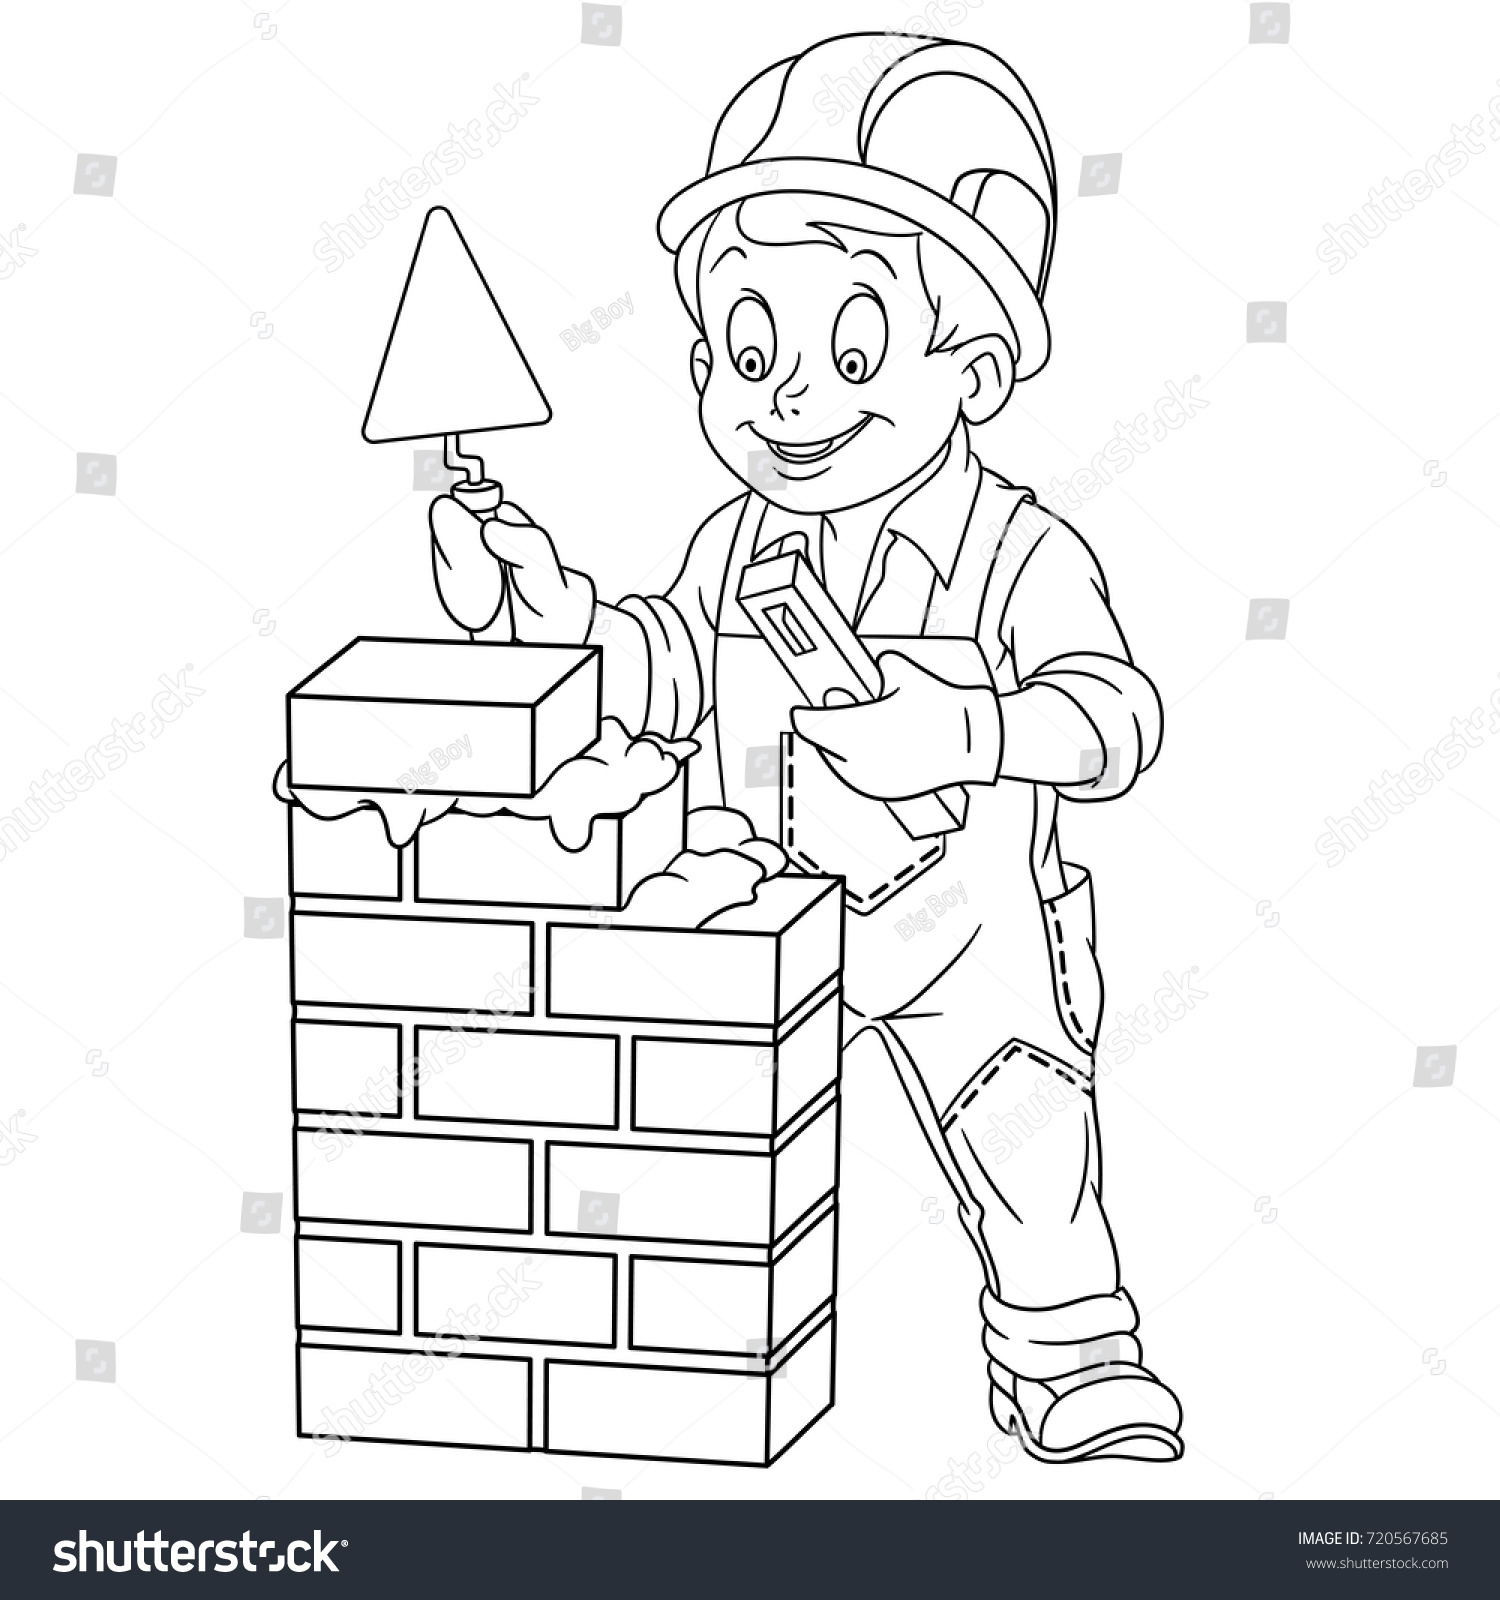 printable brick wall coloring pages - photo#21